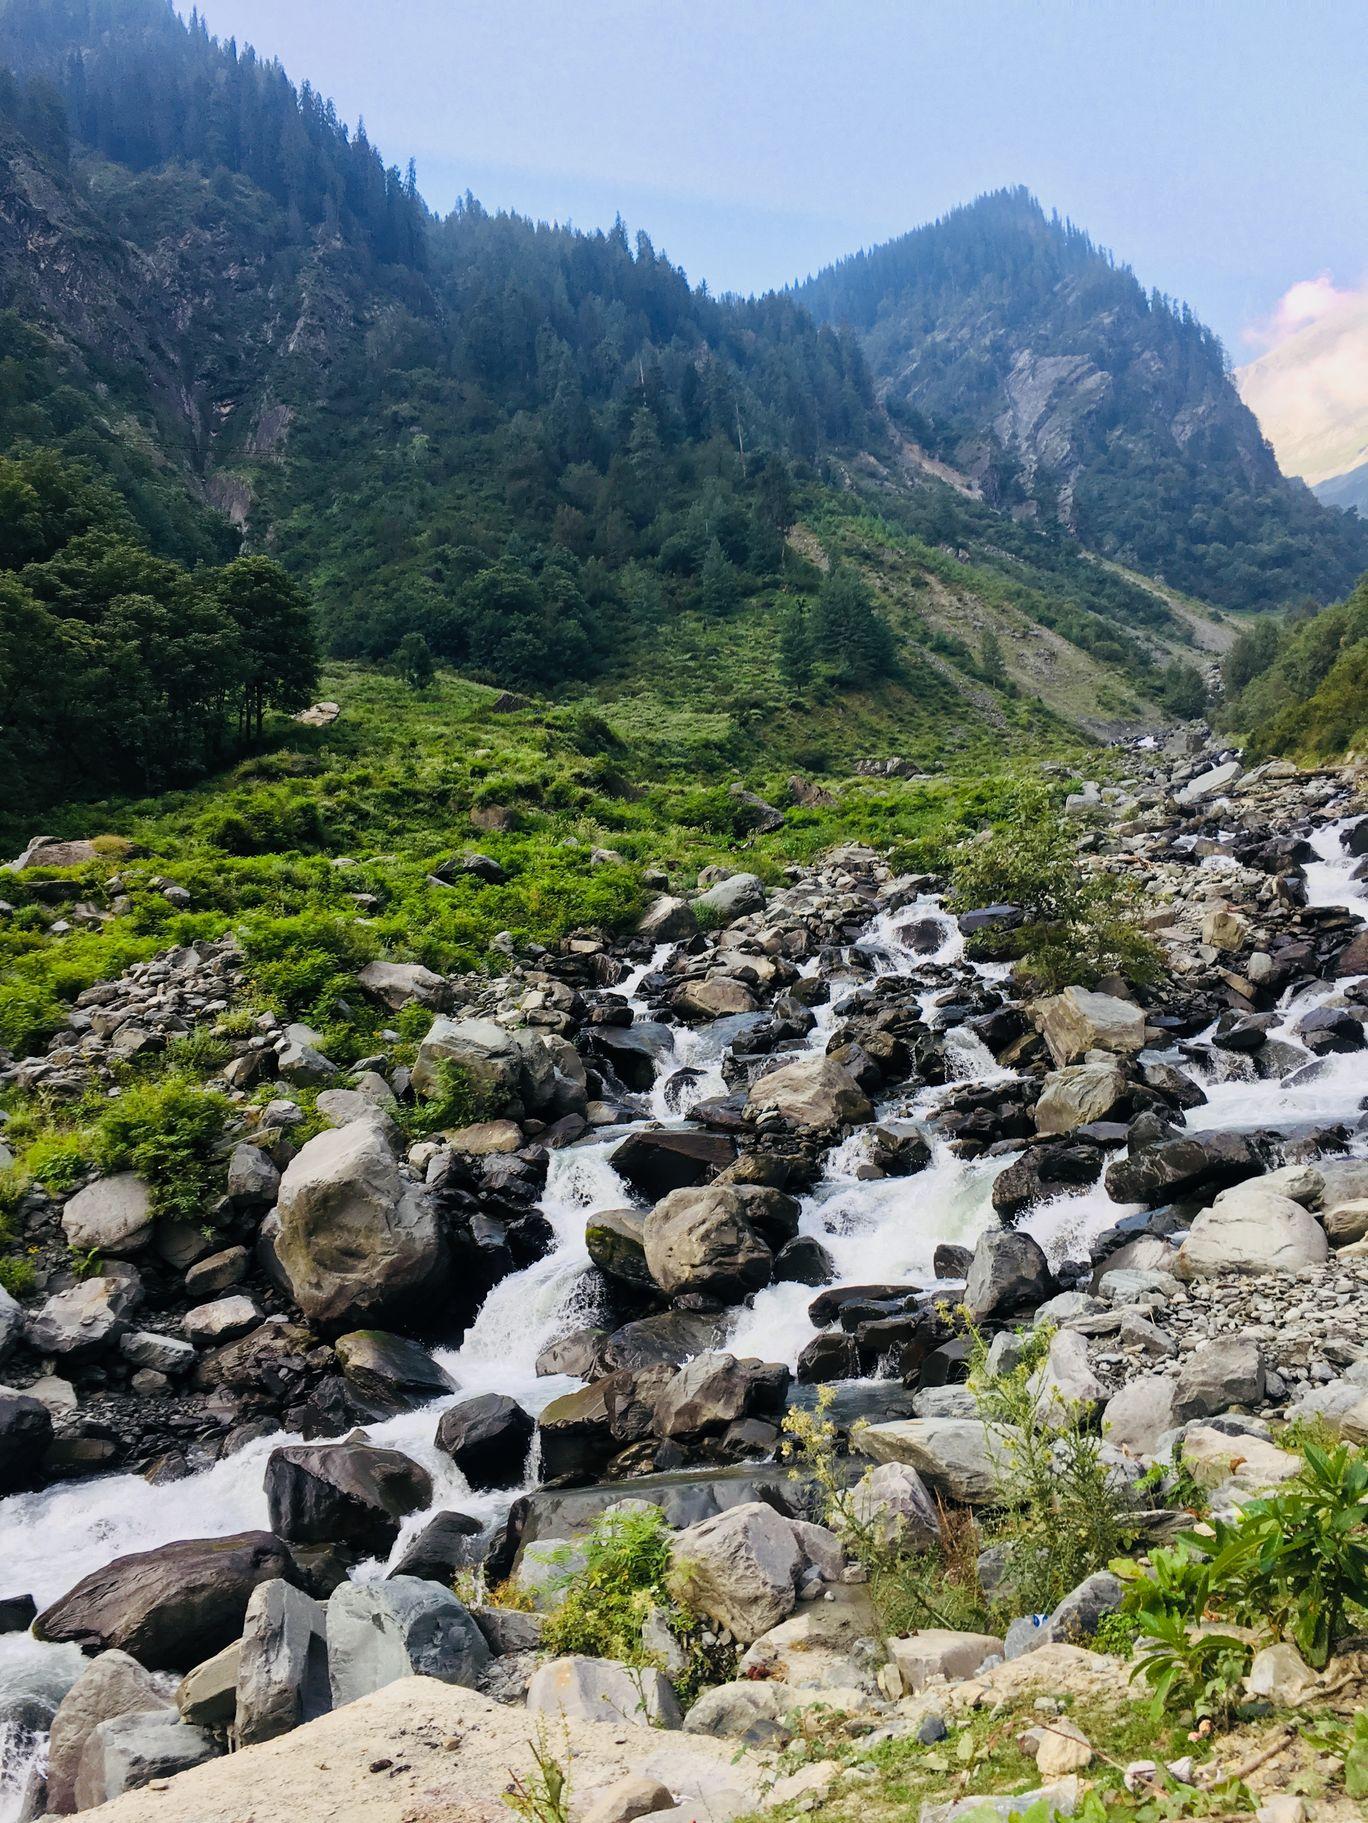 Photo of Manimahesh Kailash Peak By Ayush shukla